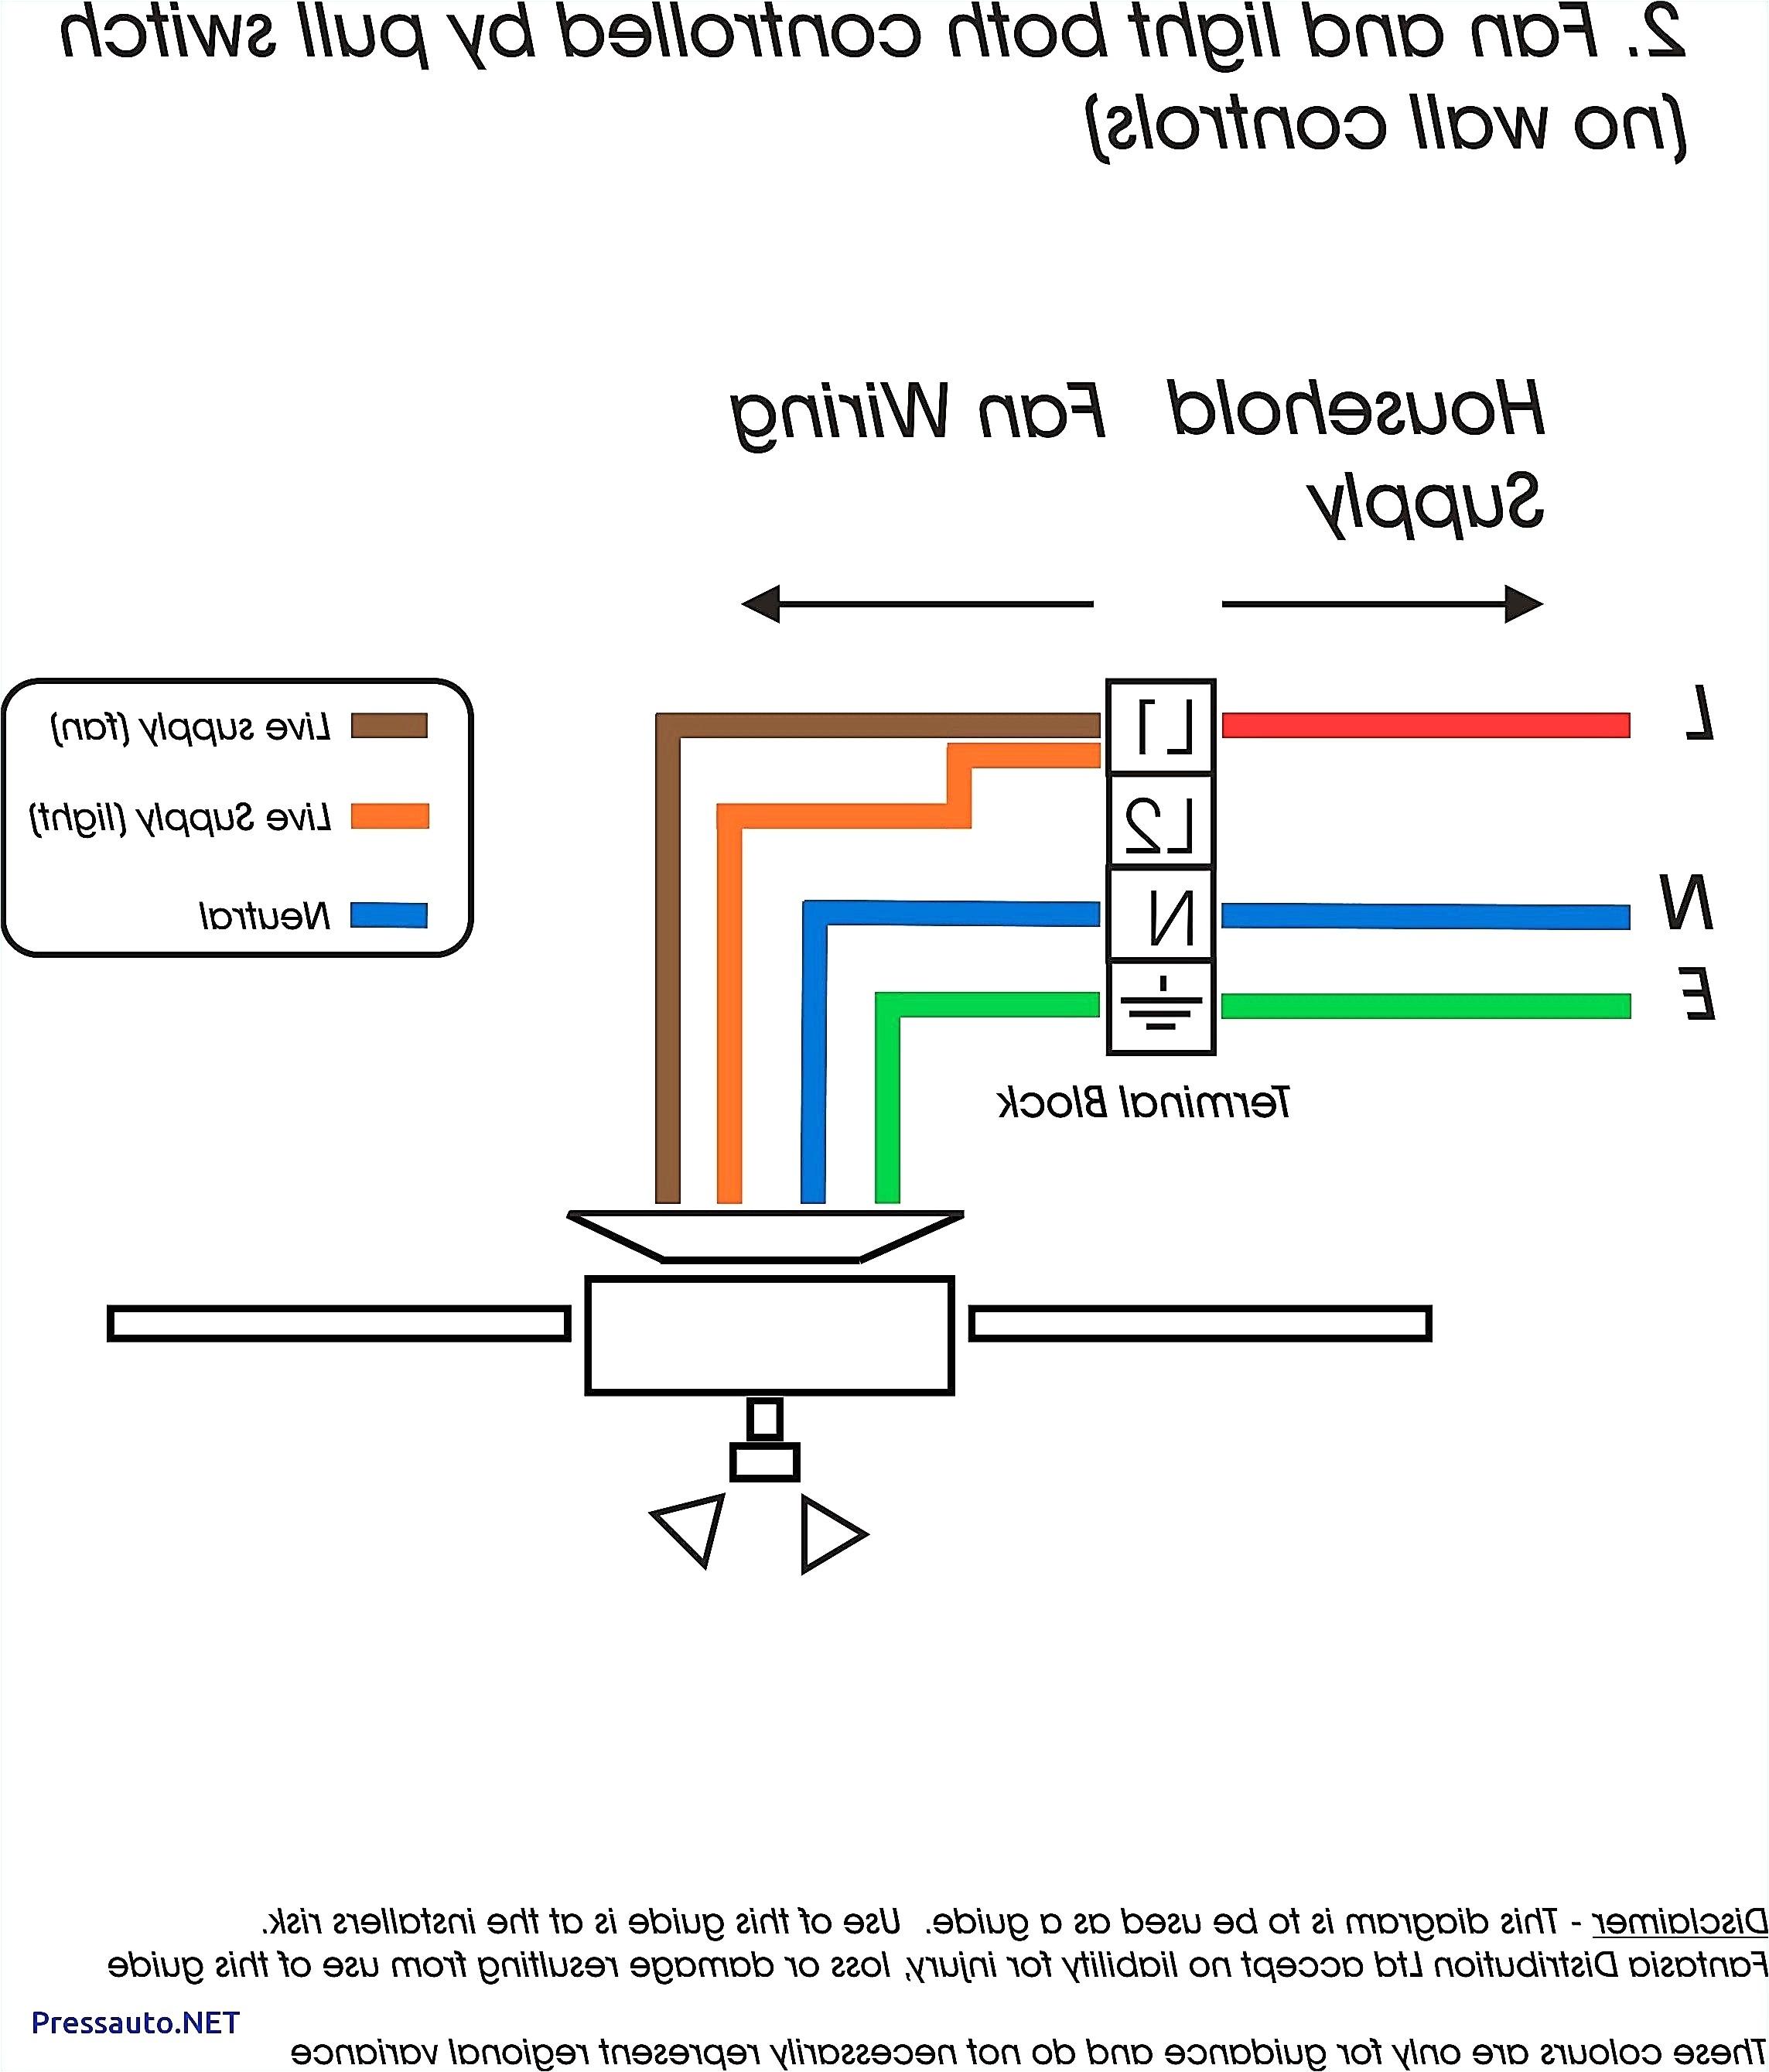 2004 jeep grand cherokee brake light wiring diagram wiring diagram jeep liberty heater core diagram 2004